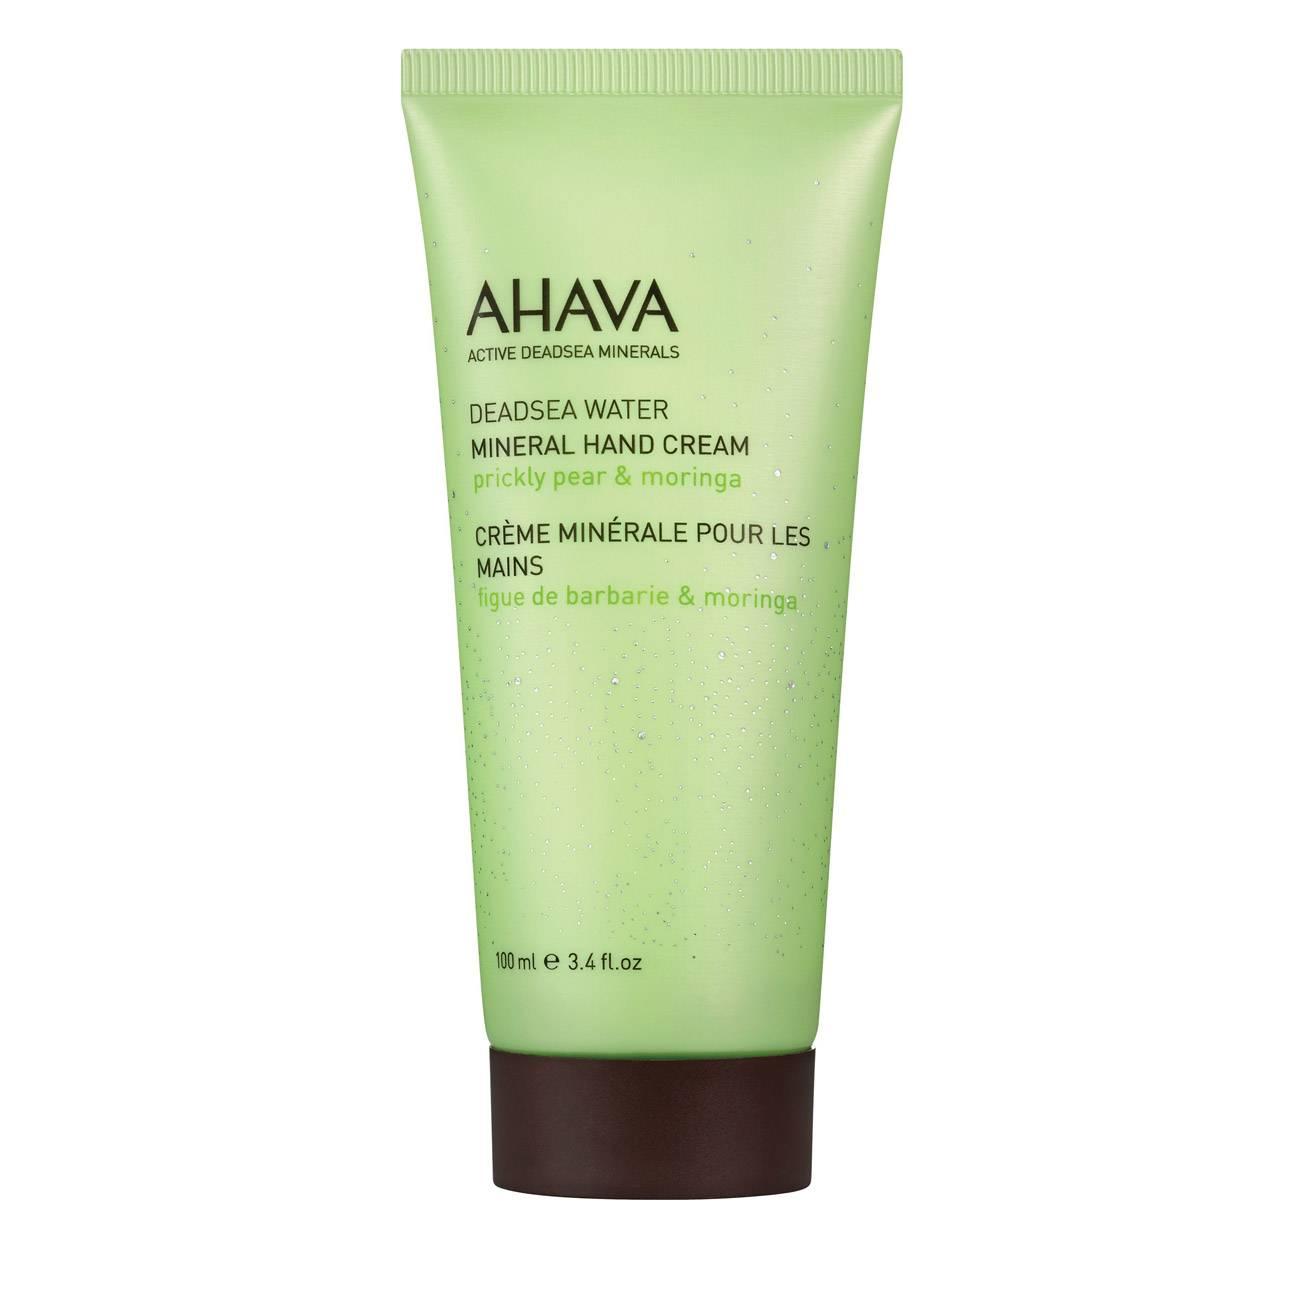 Deadsea Water Mineral Hand Cream Prickly Pear & Moringa 100 Ml Ahava imagine 2021 bestvalue.eu